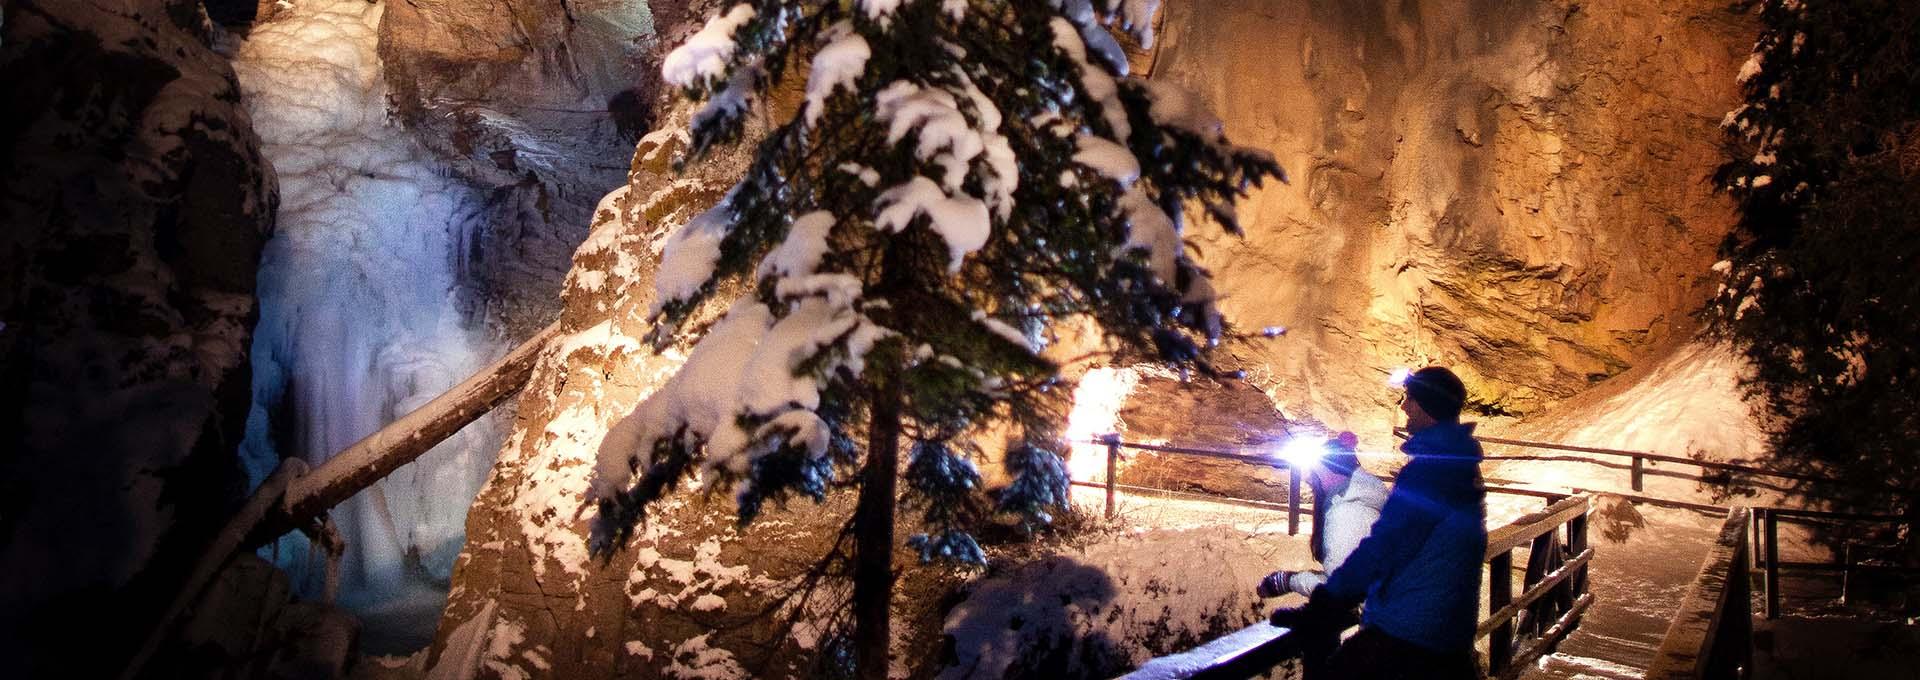 Johnston Canyon Icewalk ® Evening